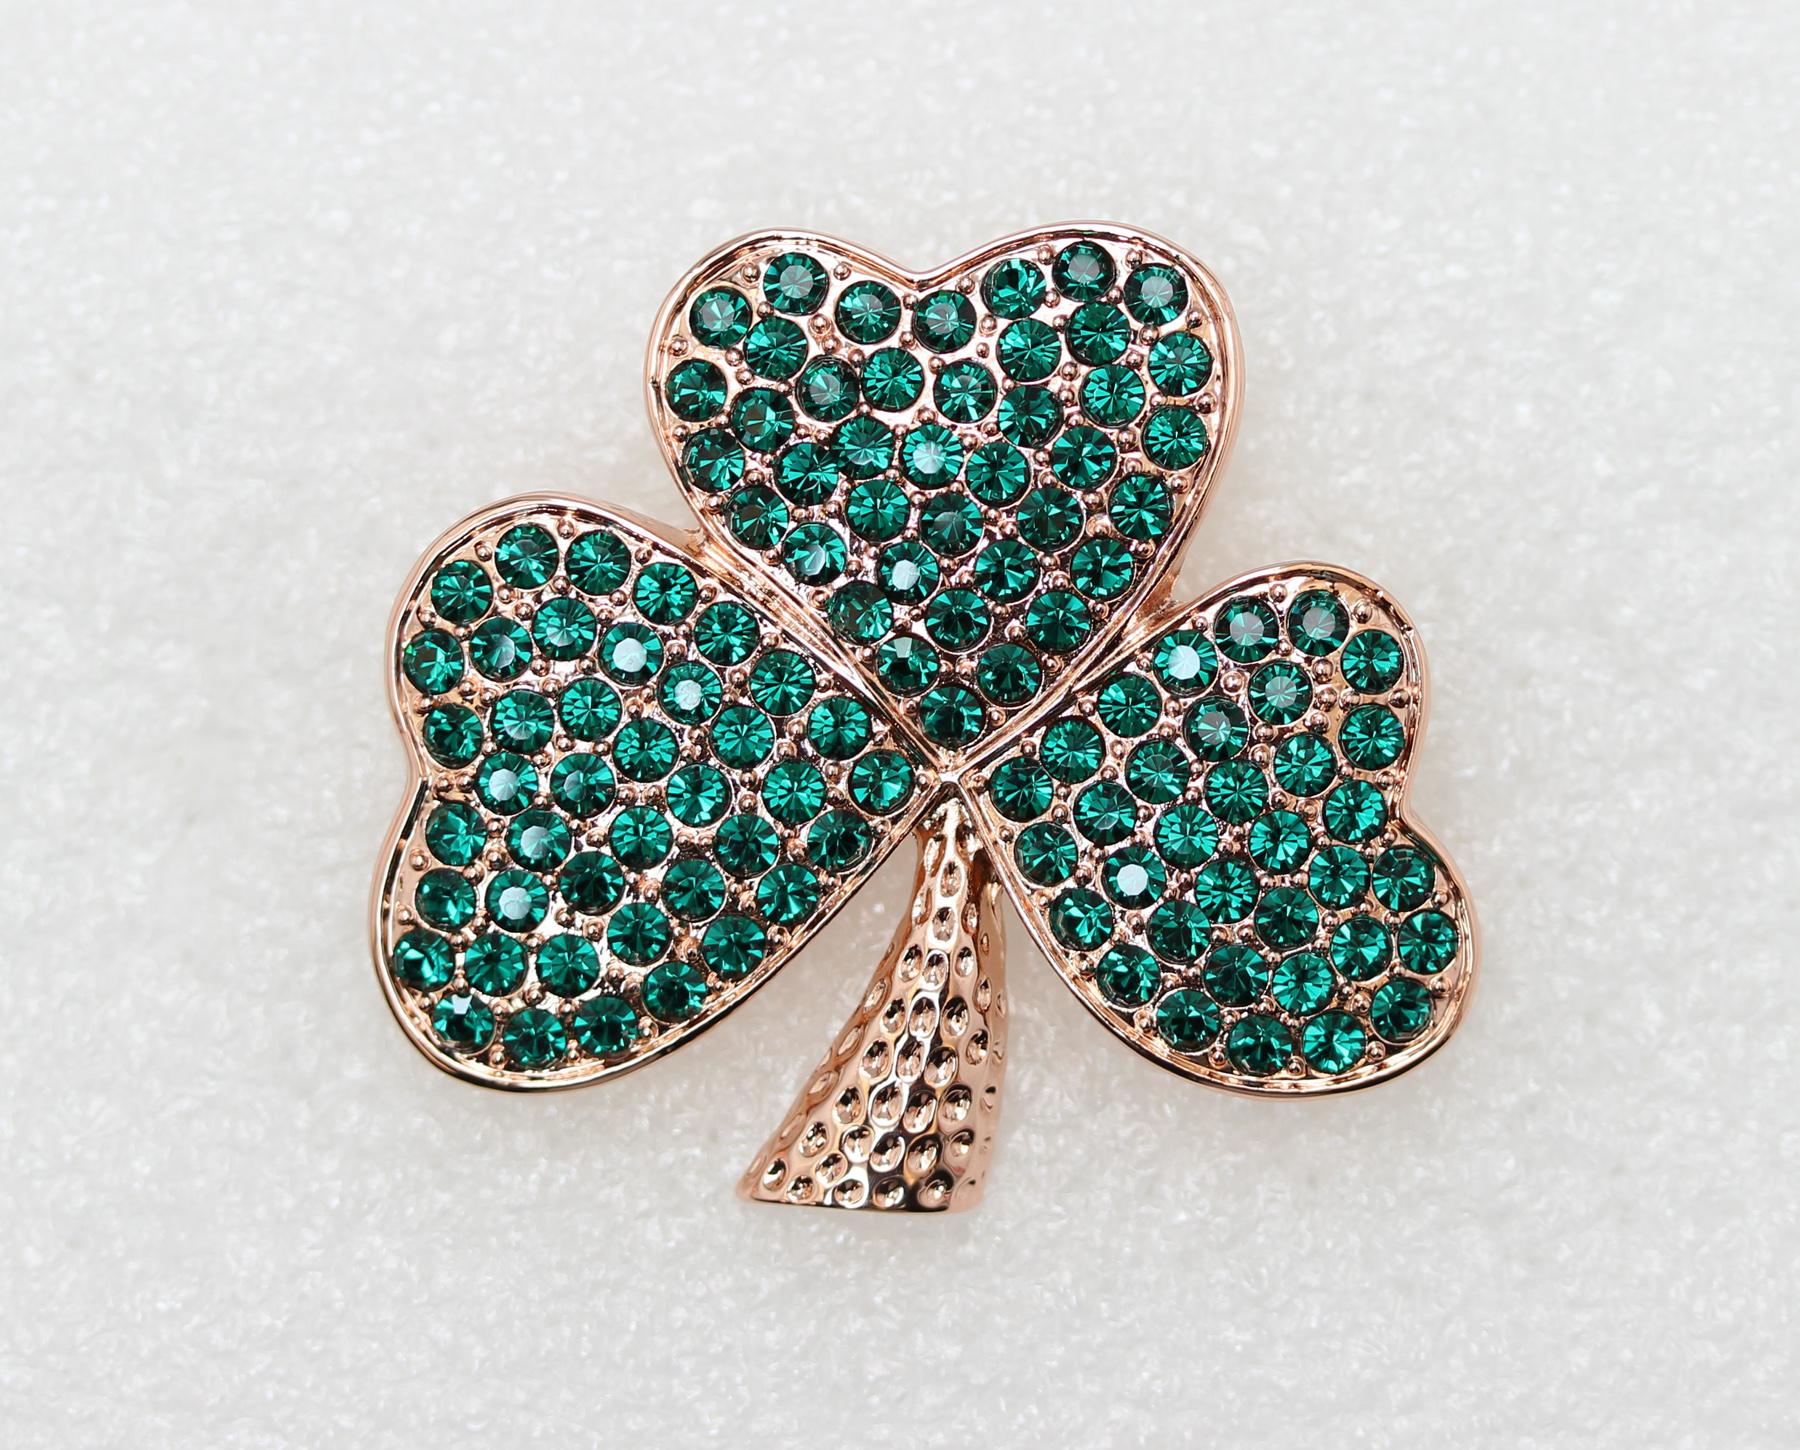 Emerald-Color-Green-Crystal-Shamrock-Clover-Leaf-Pin-Brooch-St-Patricks-Day thumbnail 4